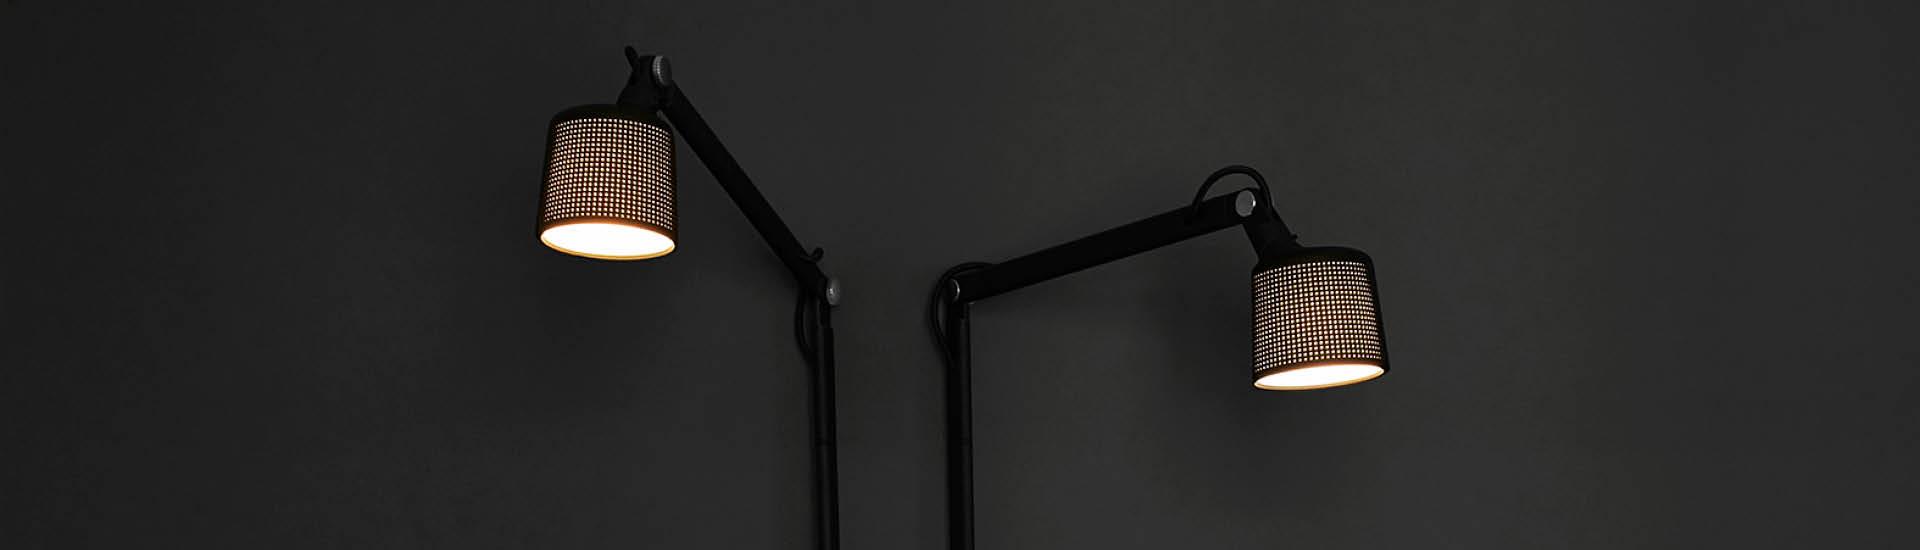 Vipp-belysning-desktop-02.jpg